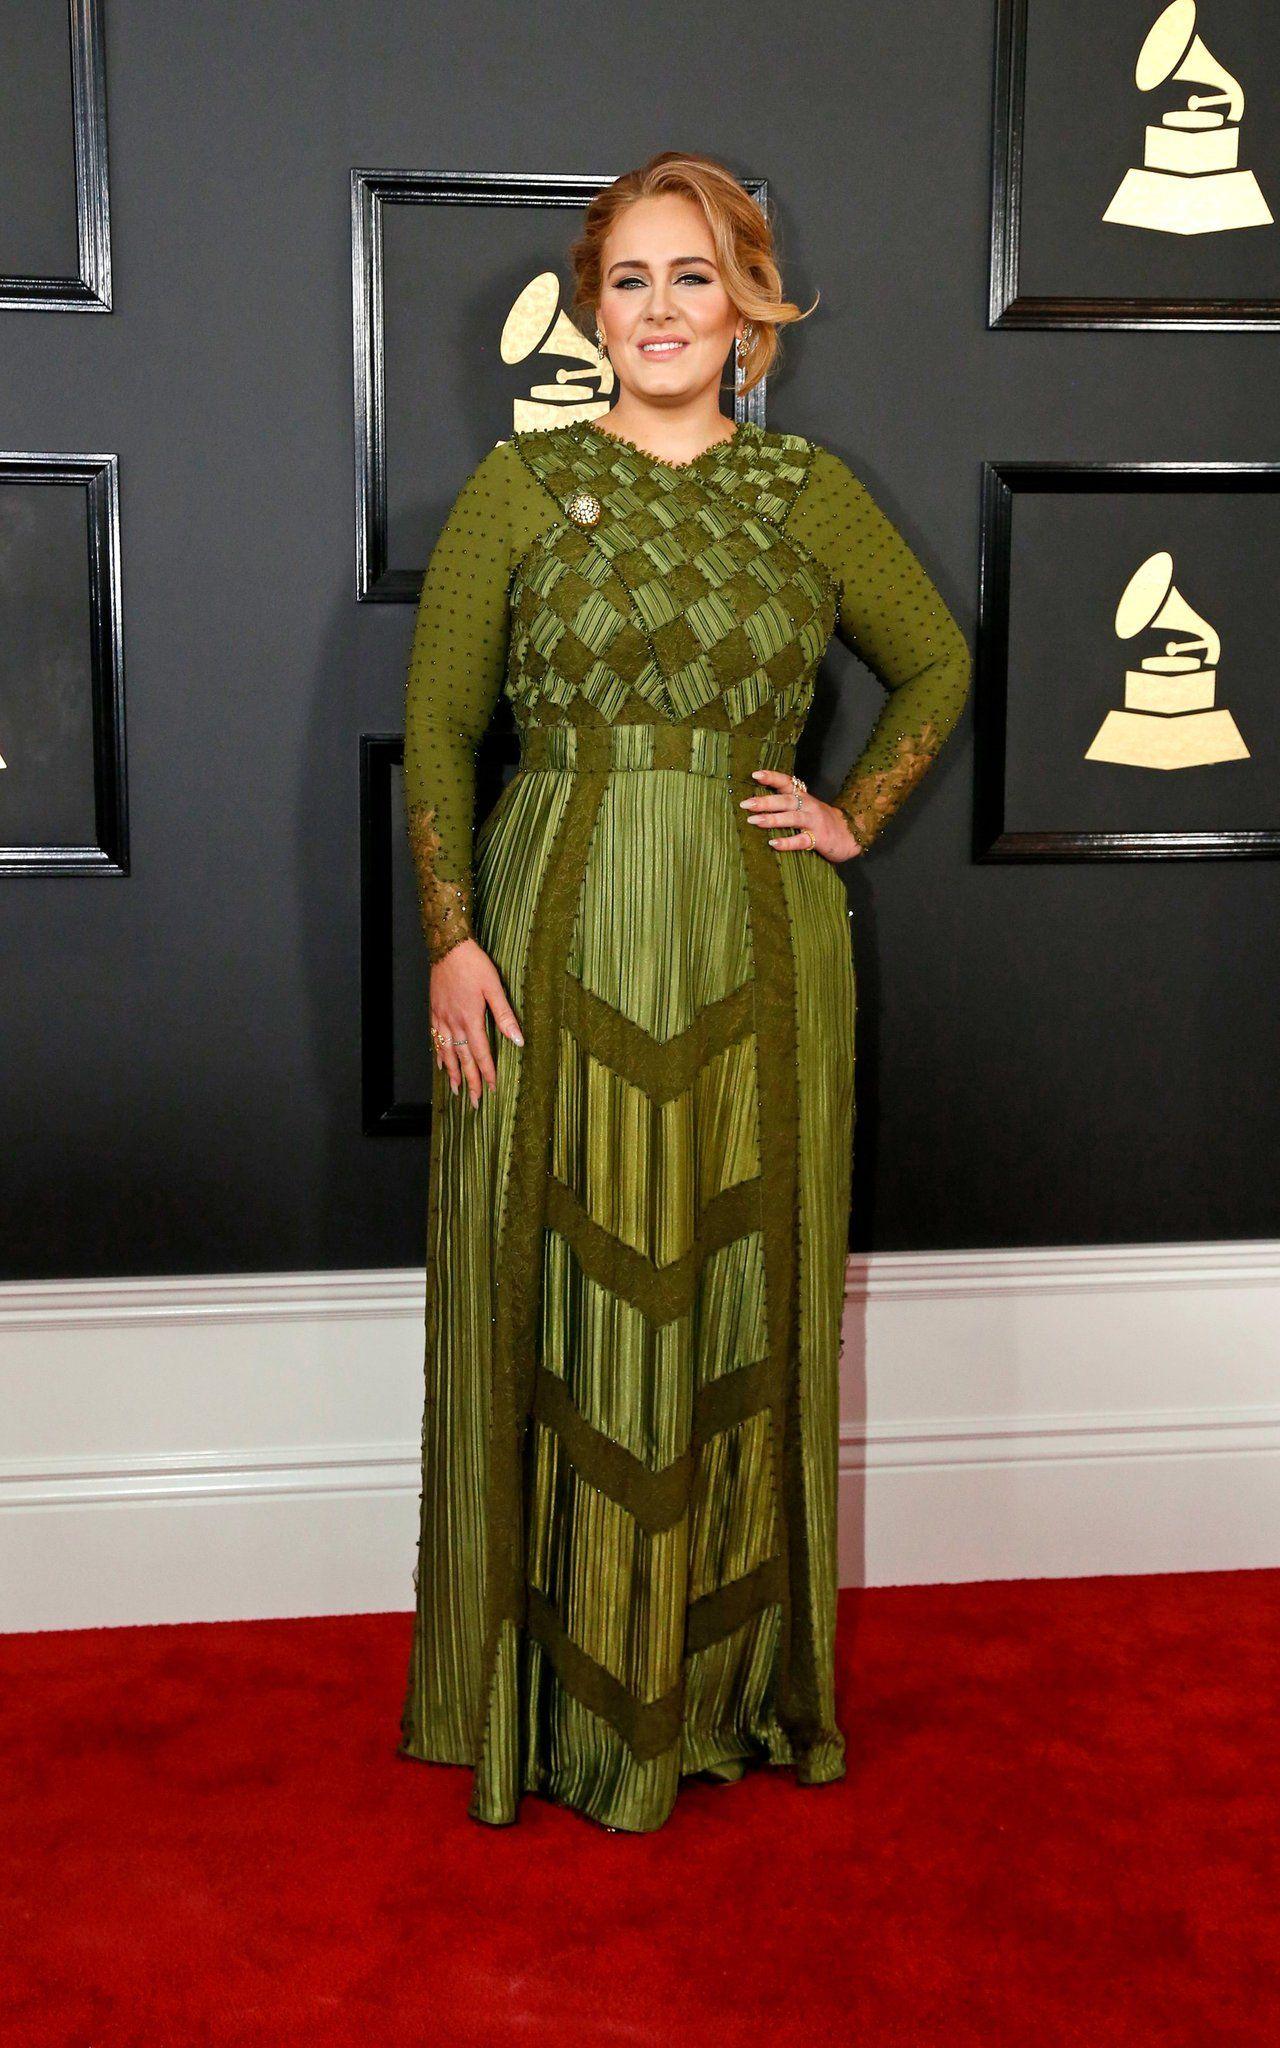 Похожее изображение | Fashion, Red carpet looks, Celebrity ...